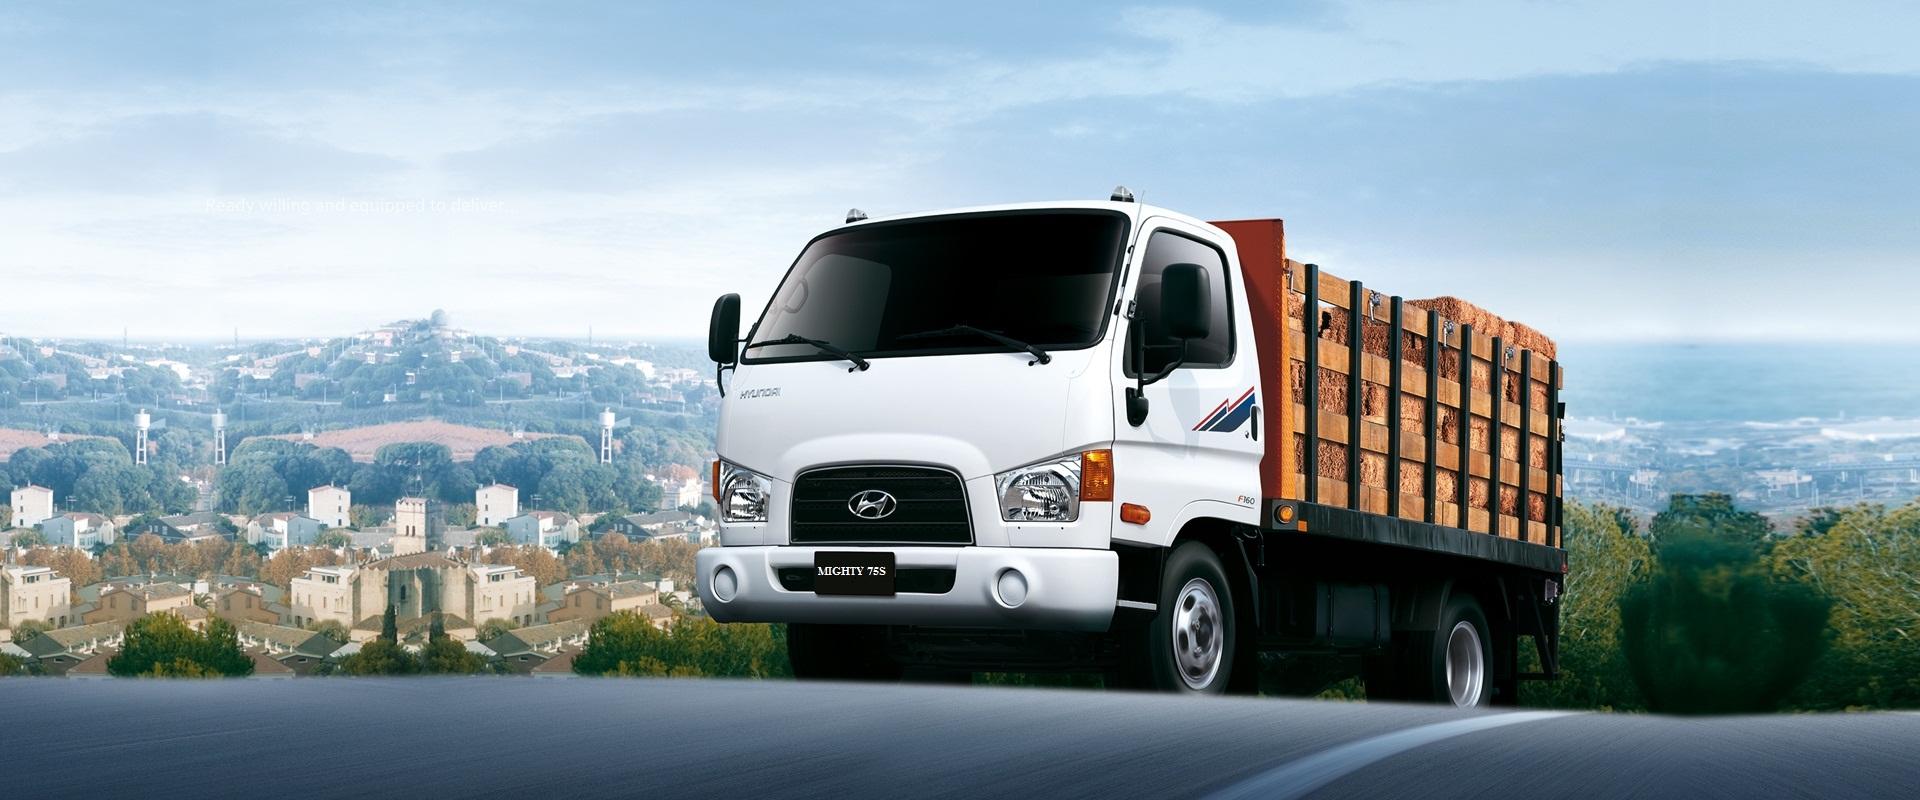 Giá Xe Tải Hyundai 110s - Hyundai Hd 110s